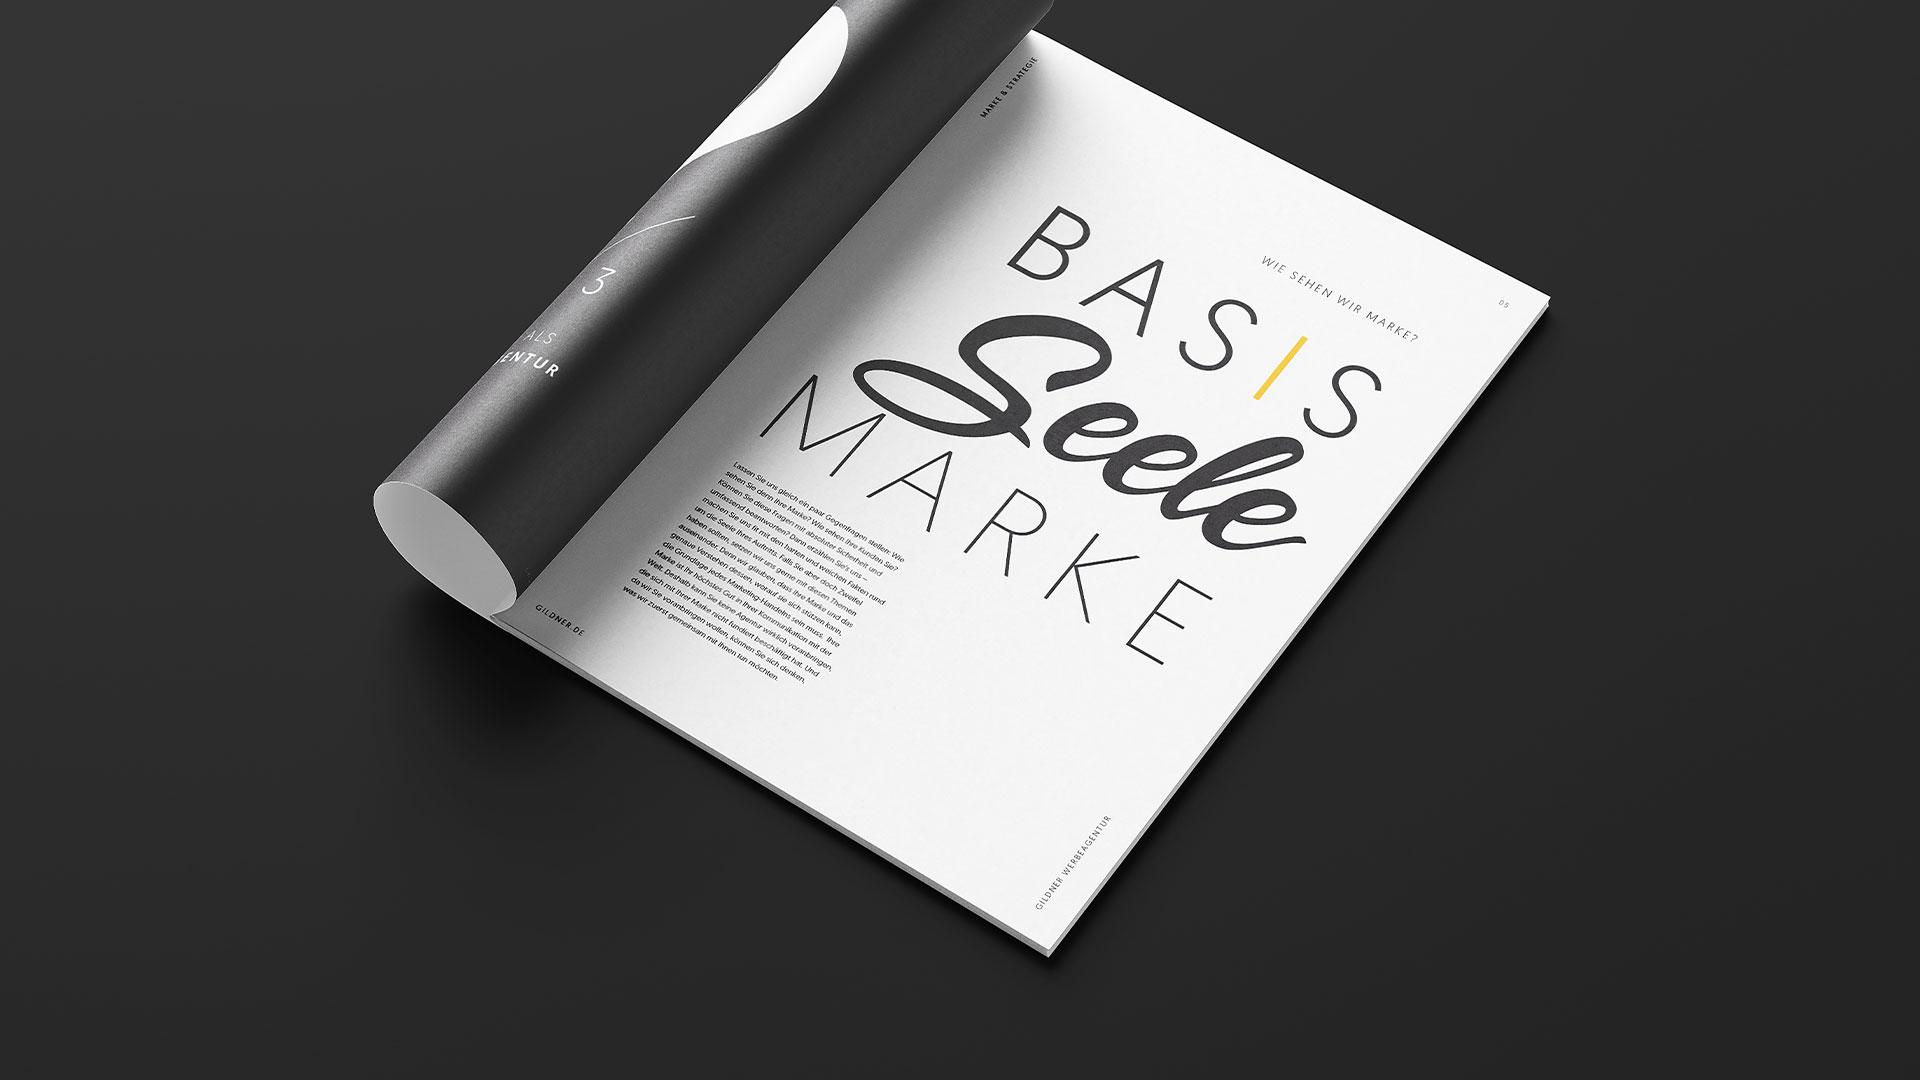 Basis, Seele, Marke